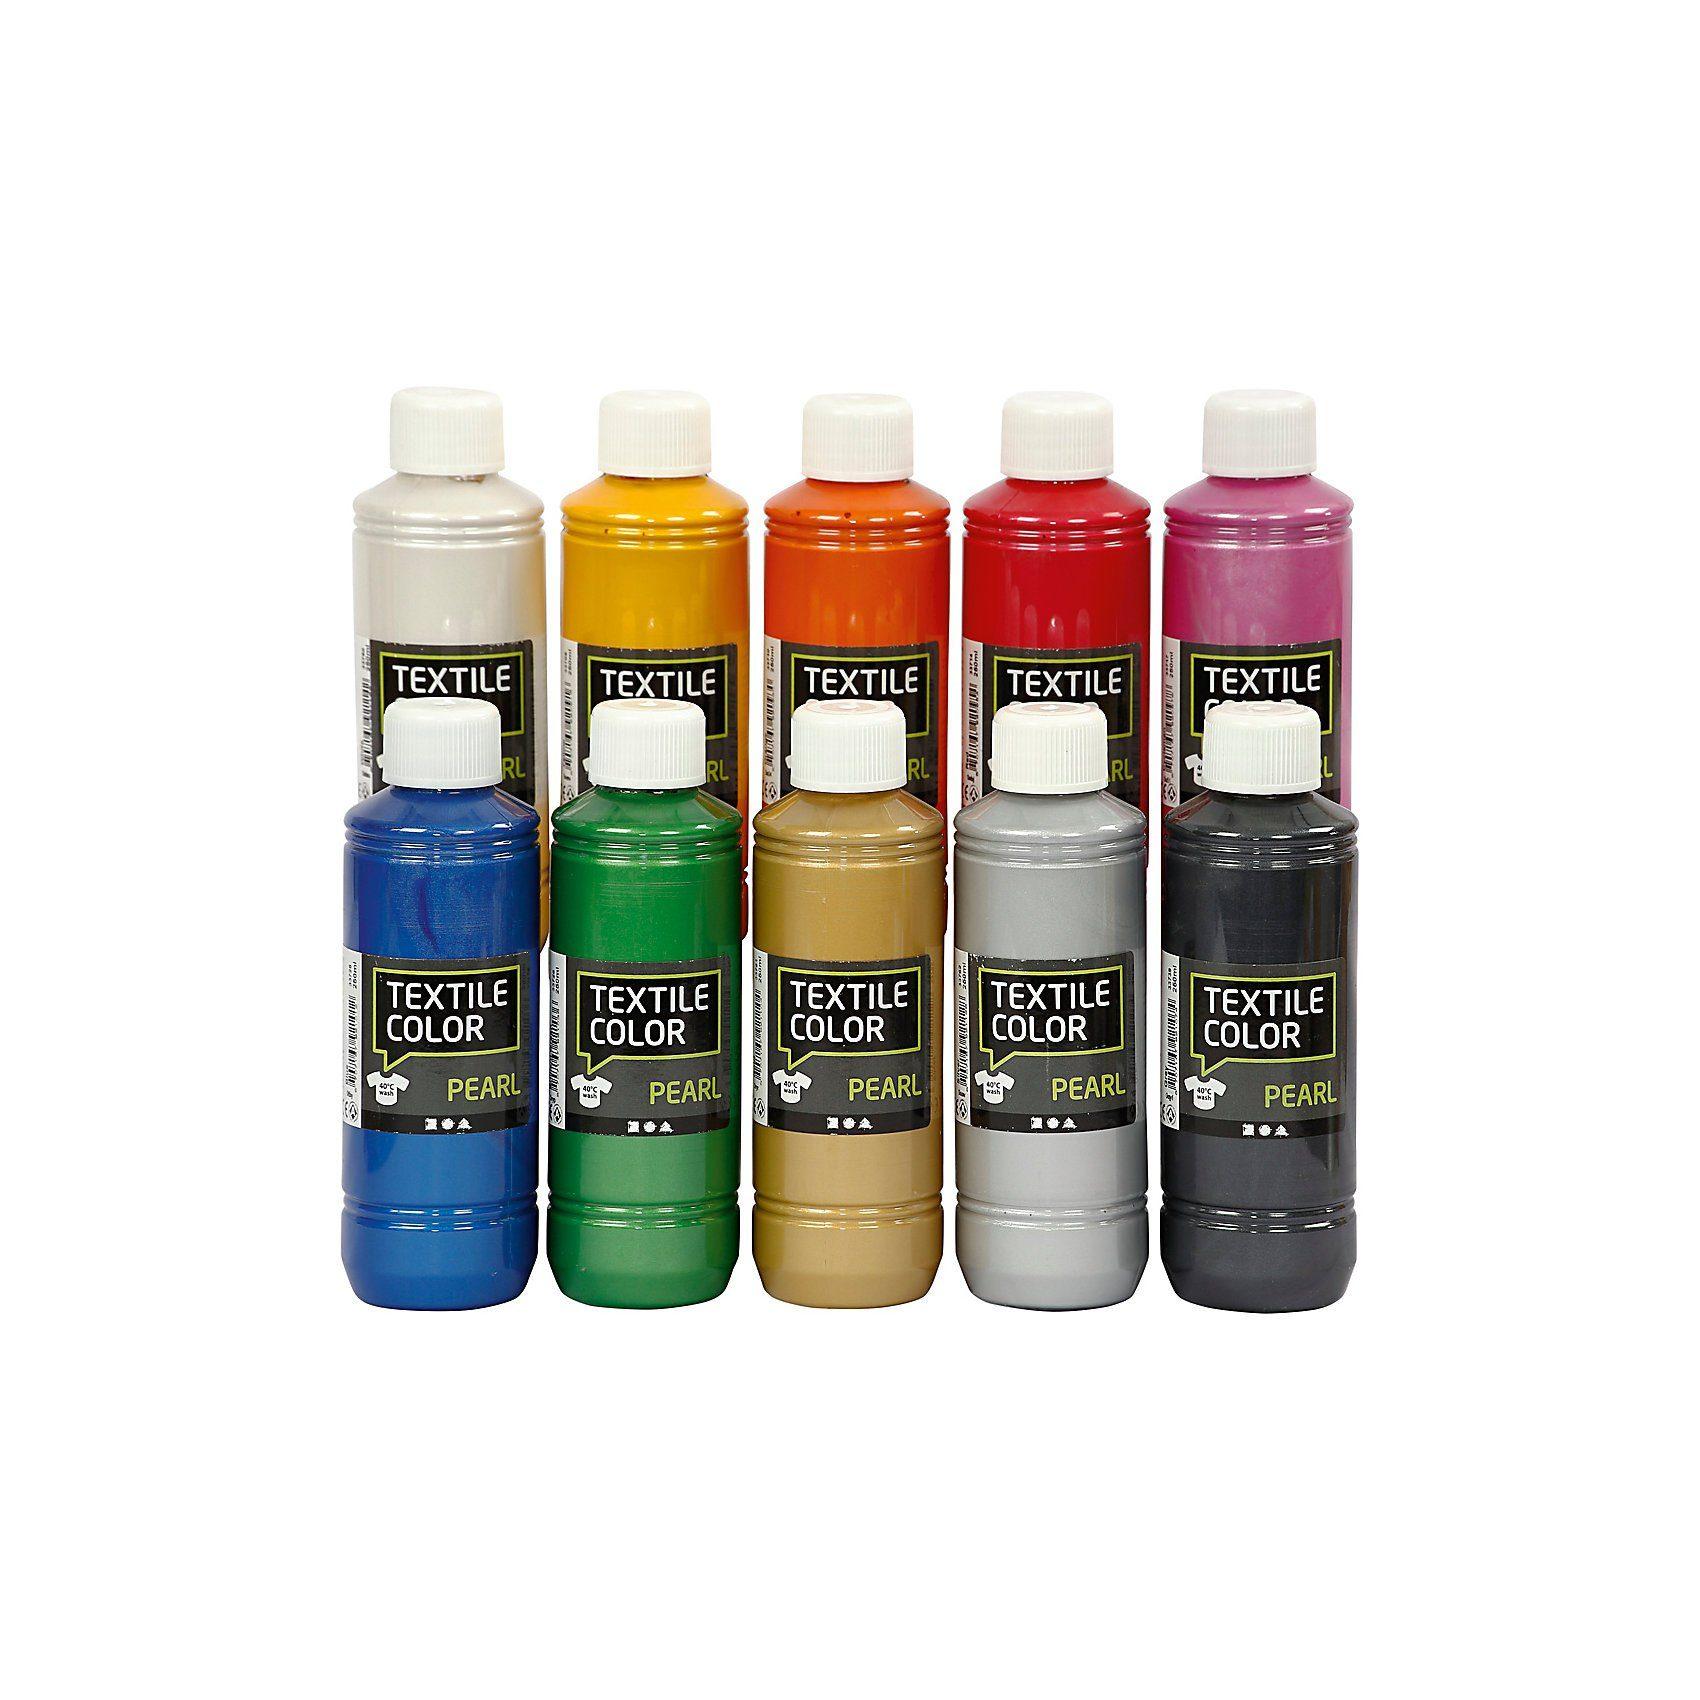 Textile Color Pearl, 10x250ml